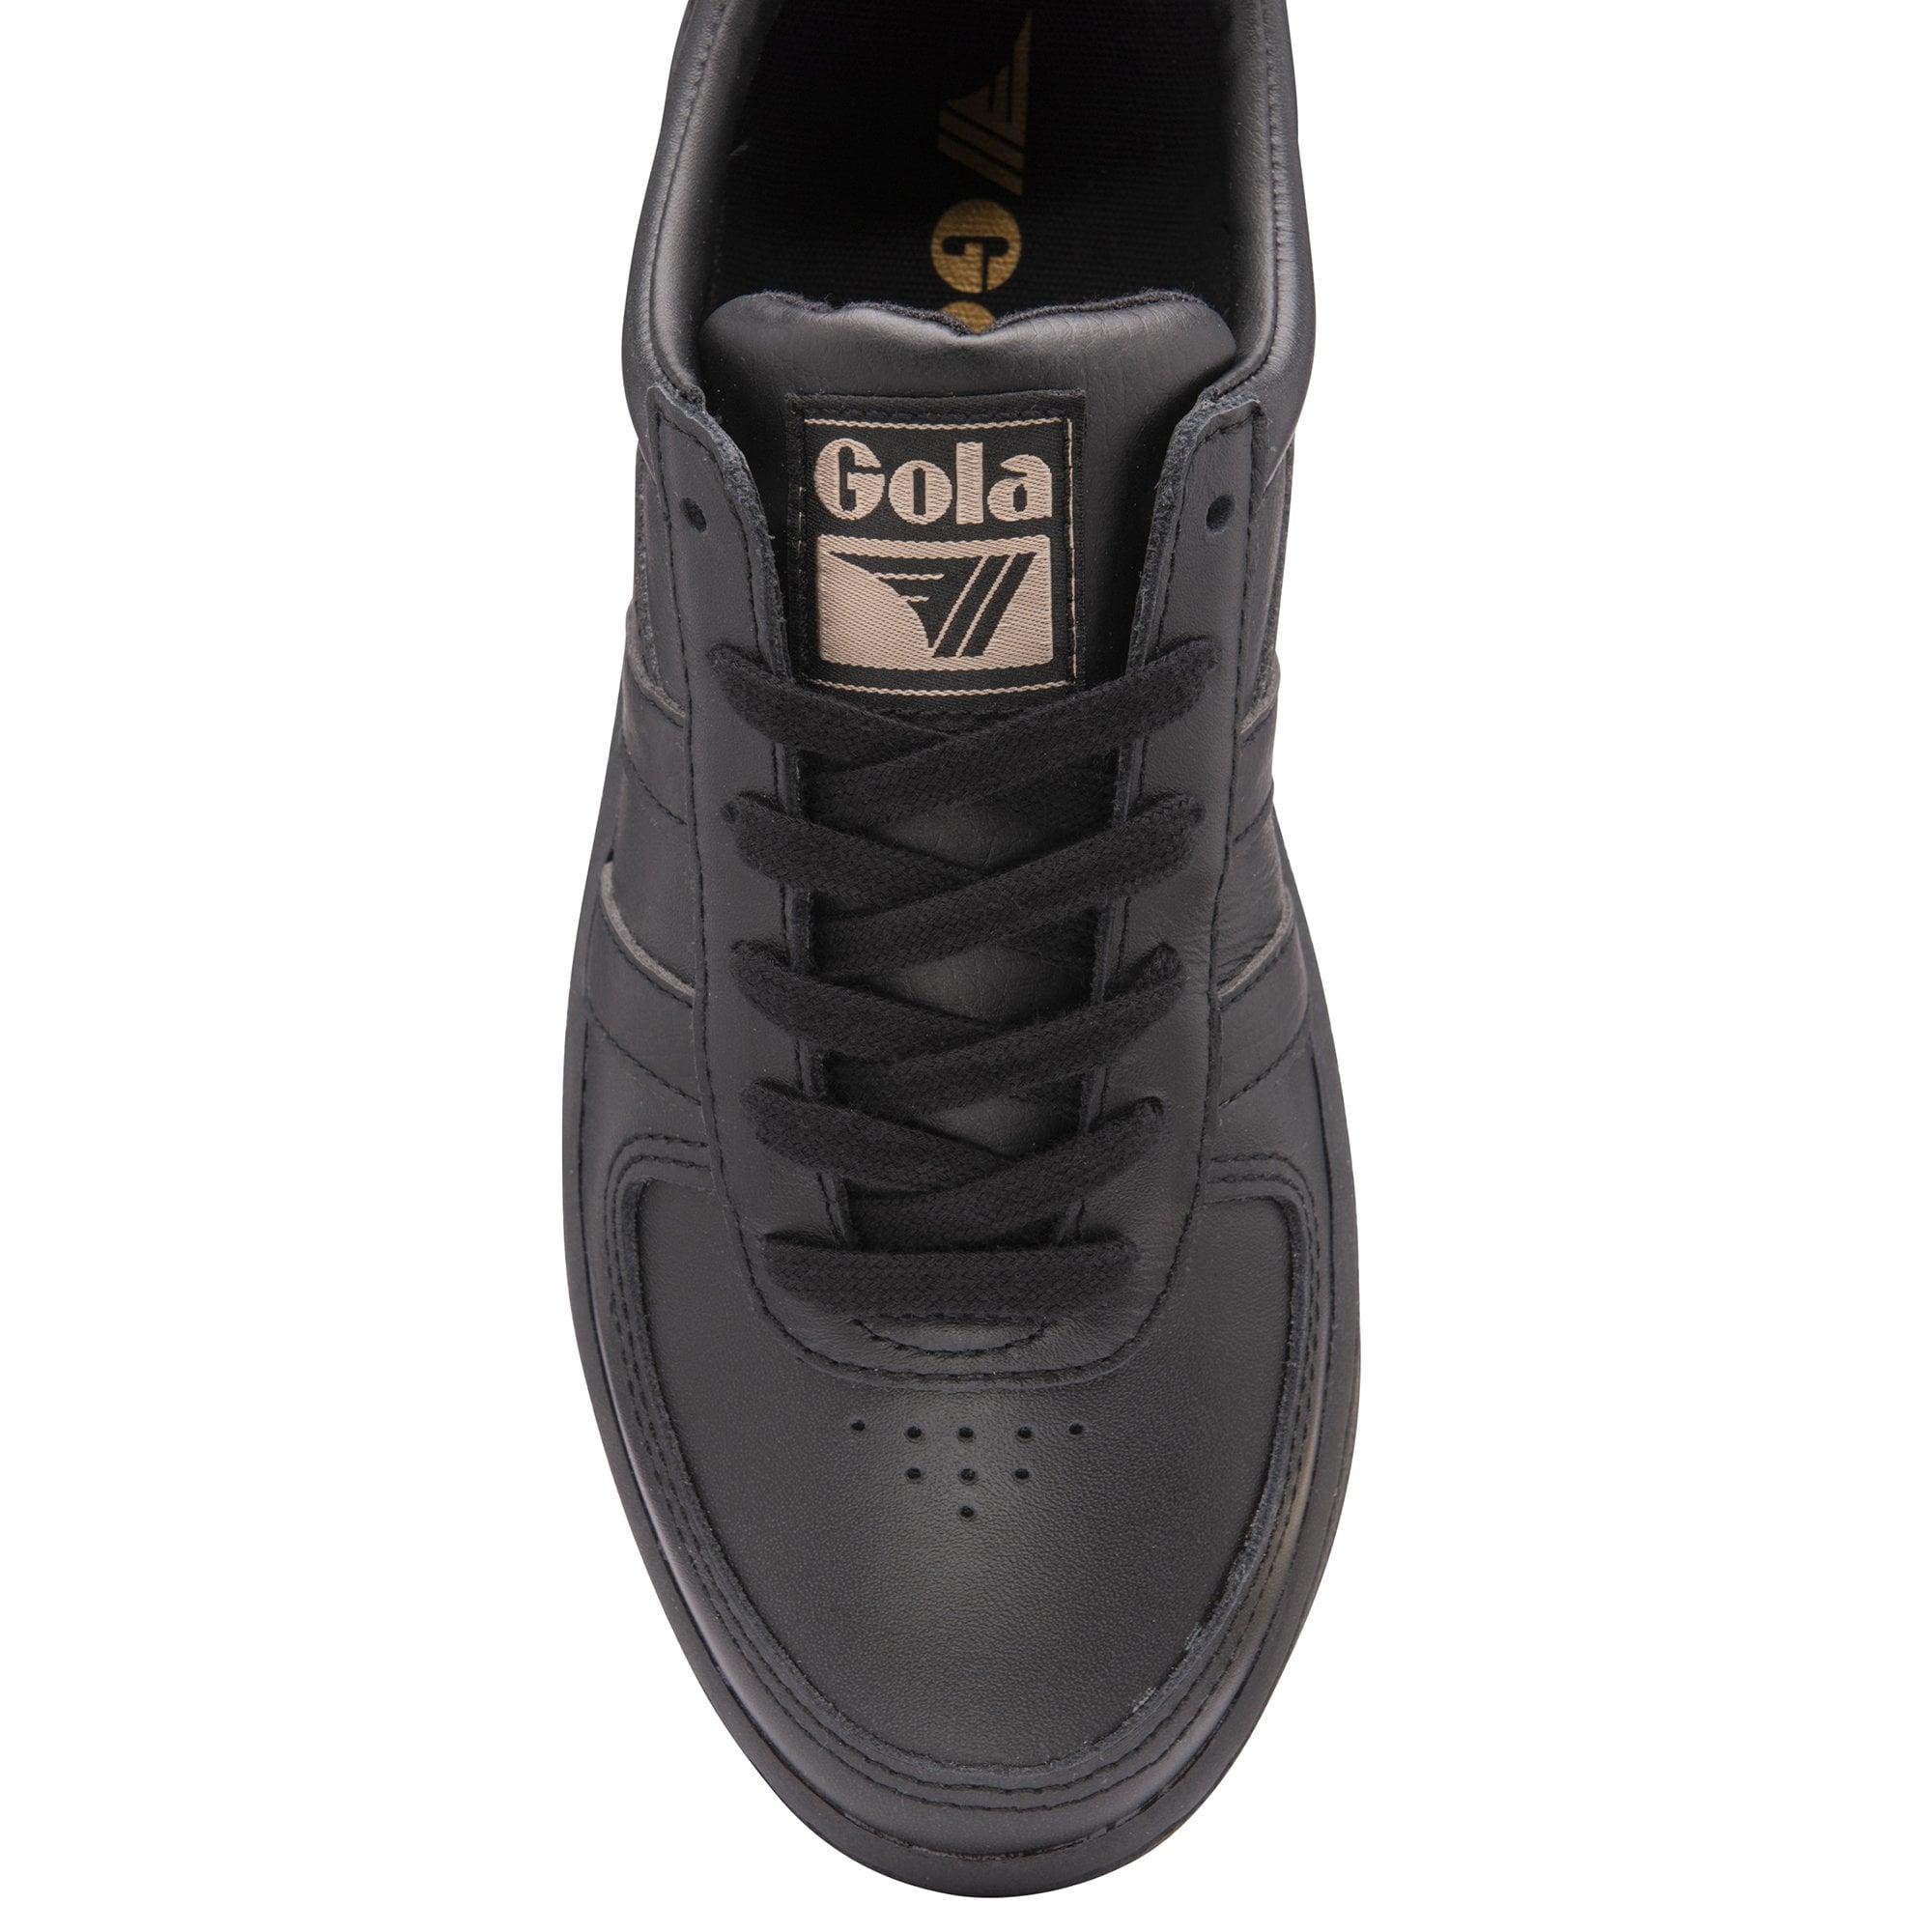 Gola womens Grandslam Leather trainers